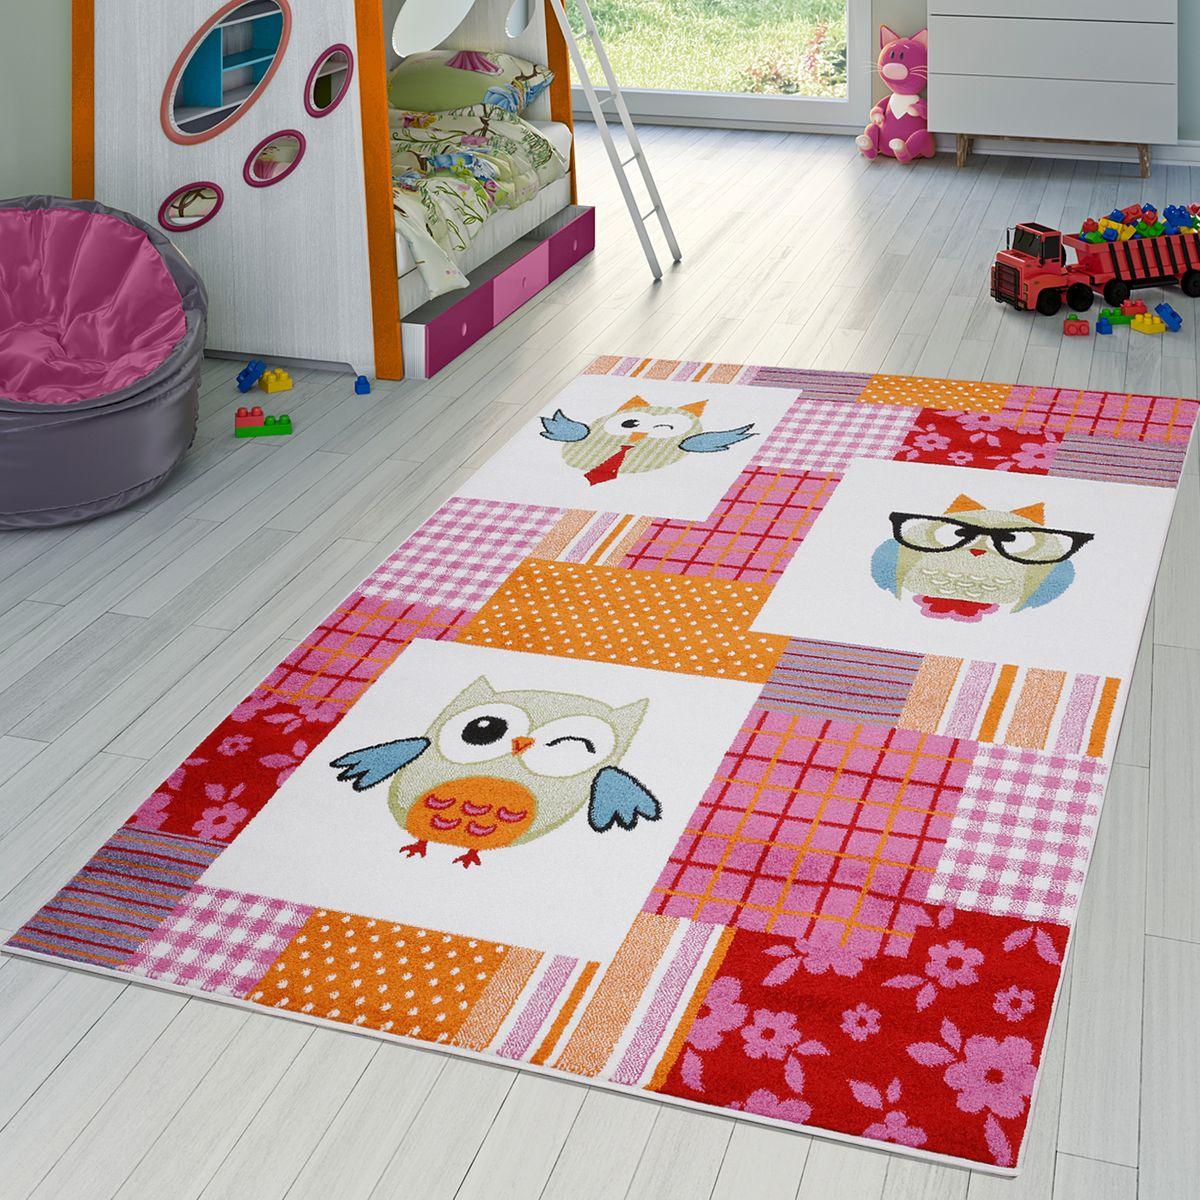 Full Size of Teppichboden Kinderzimmer Teppich Kariert Bunte Eulen Kurzflor Pink Grn Creme Sofa Regal Regale Weiß Kinderzimmer Teppichboden Kinderzimmer